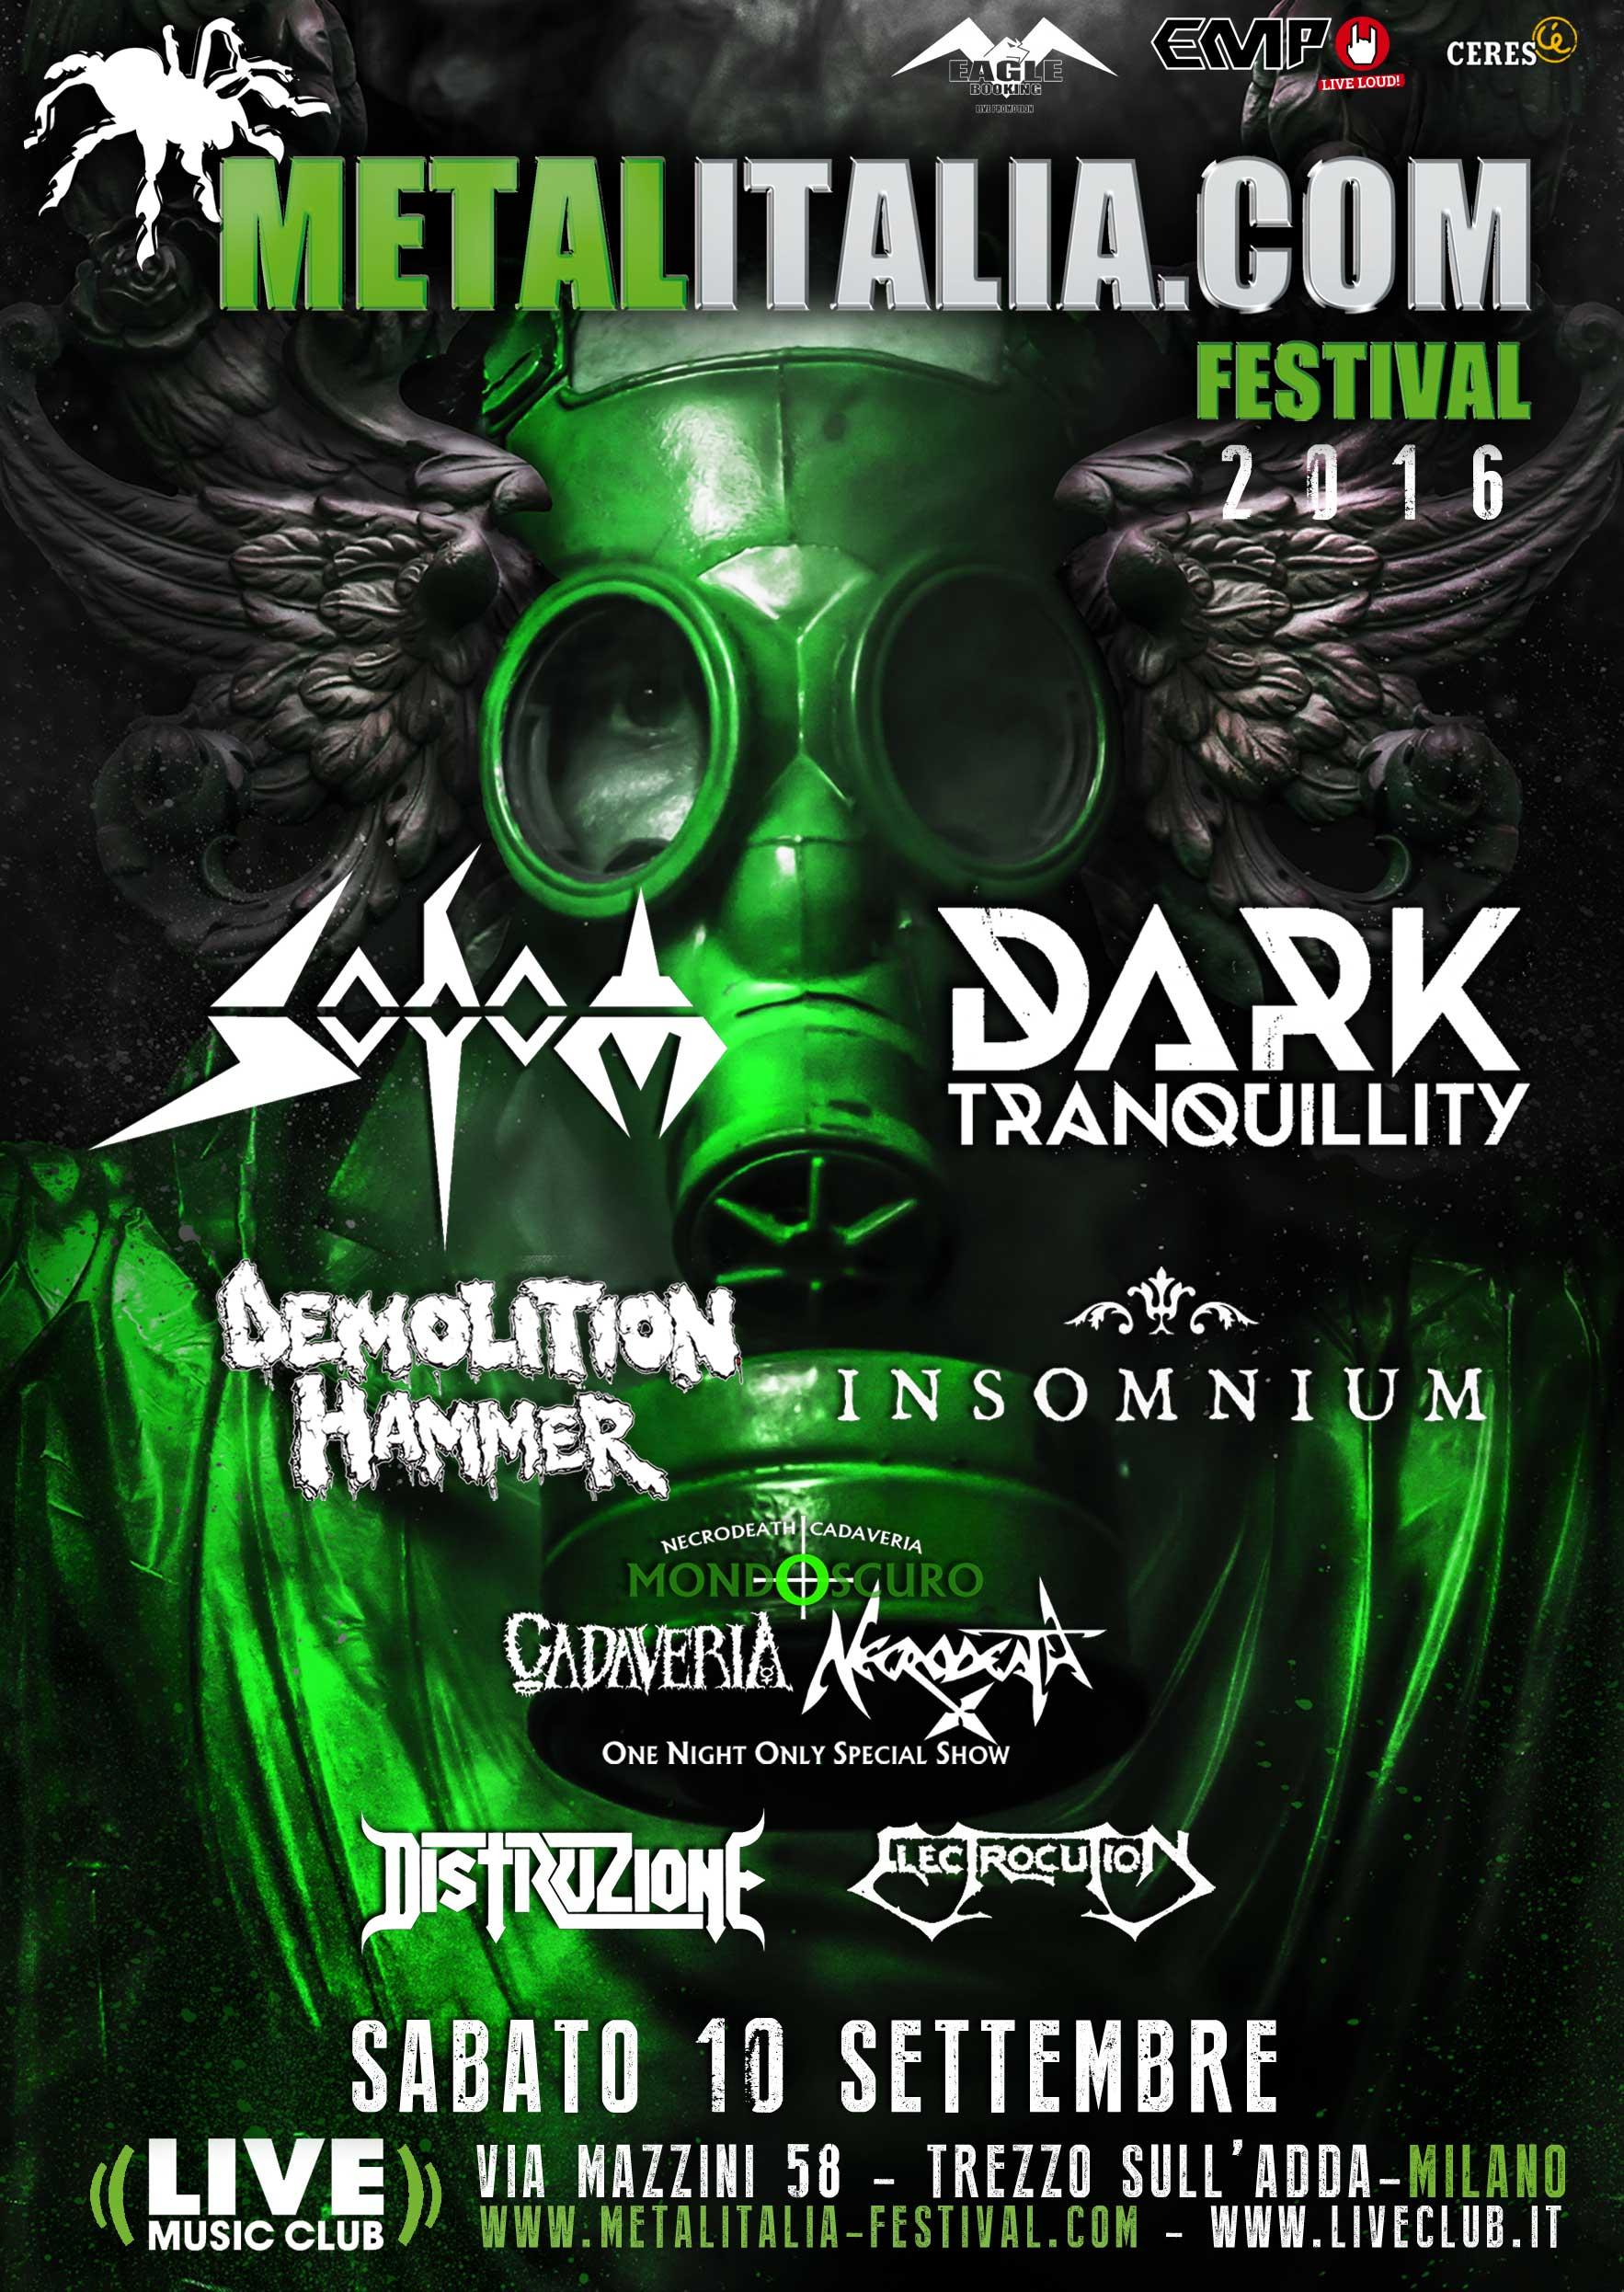 metalitalia festival 2016 - locandina definitiva